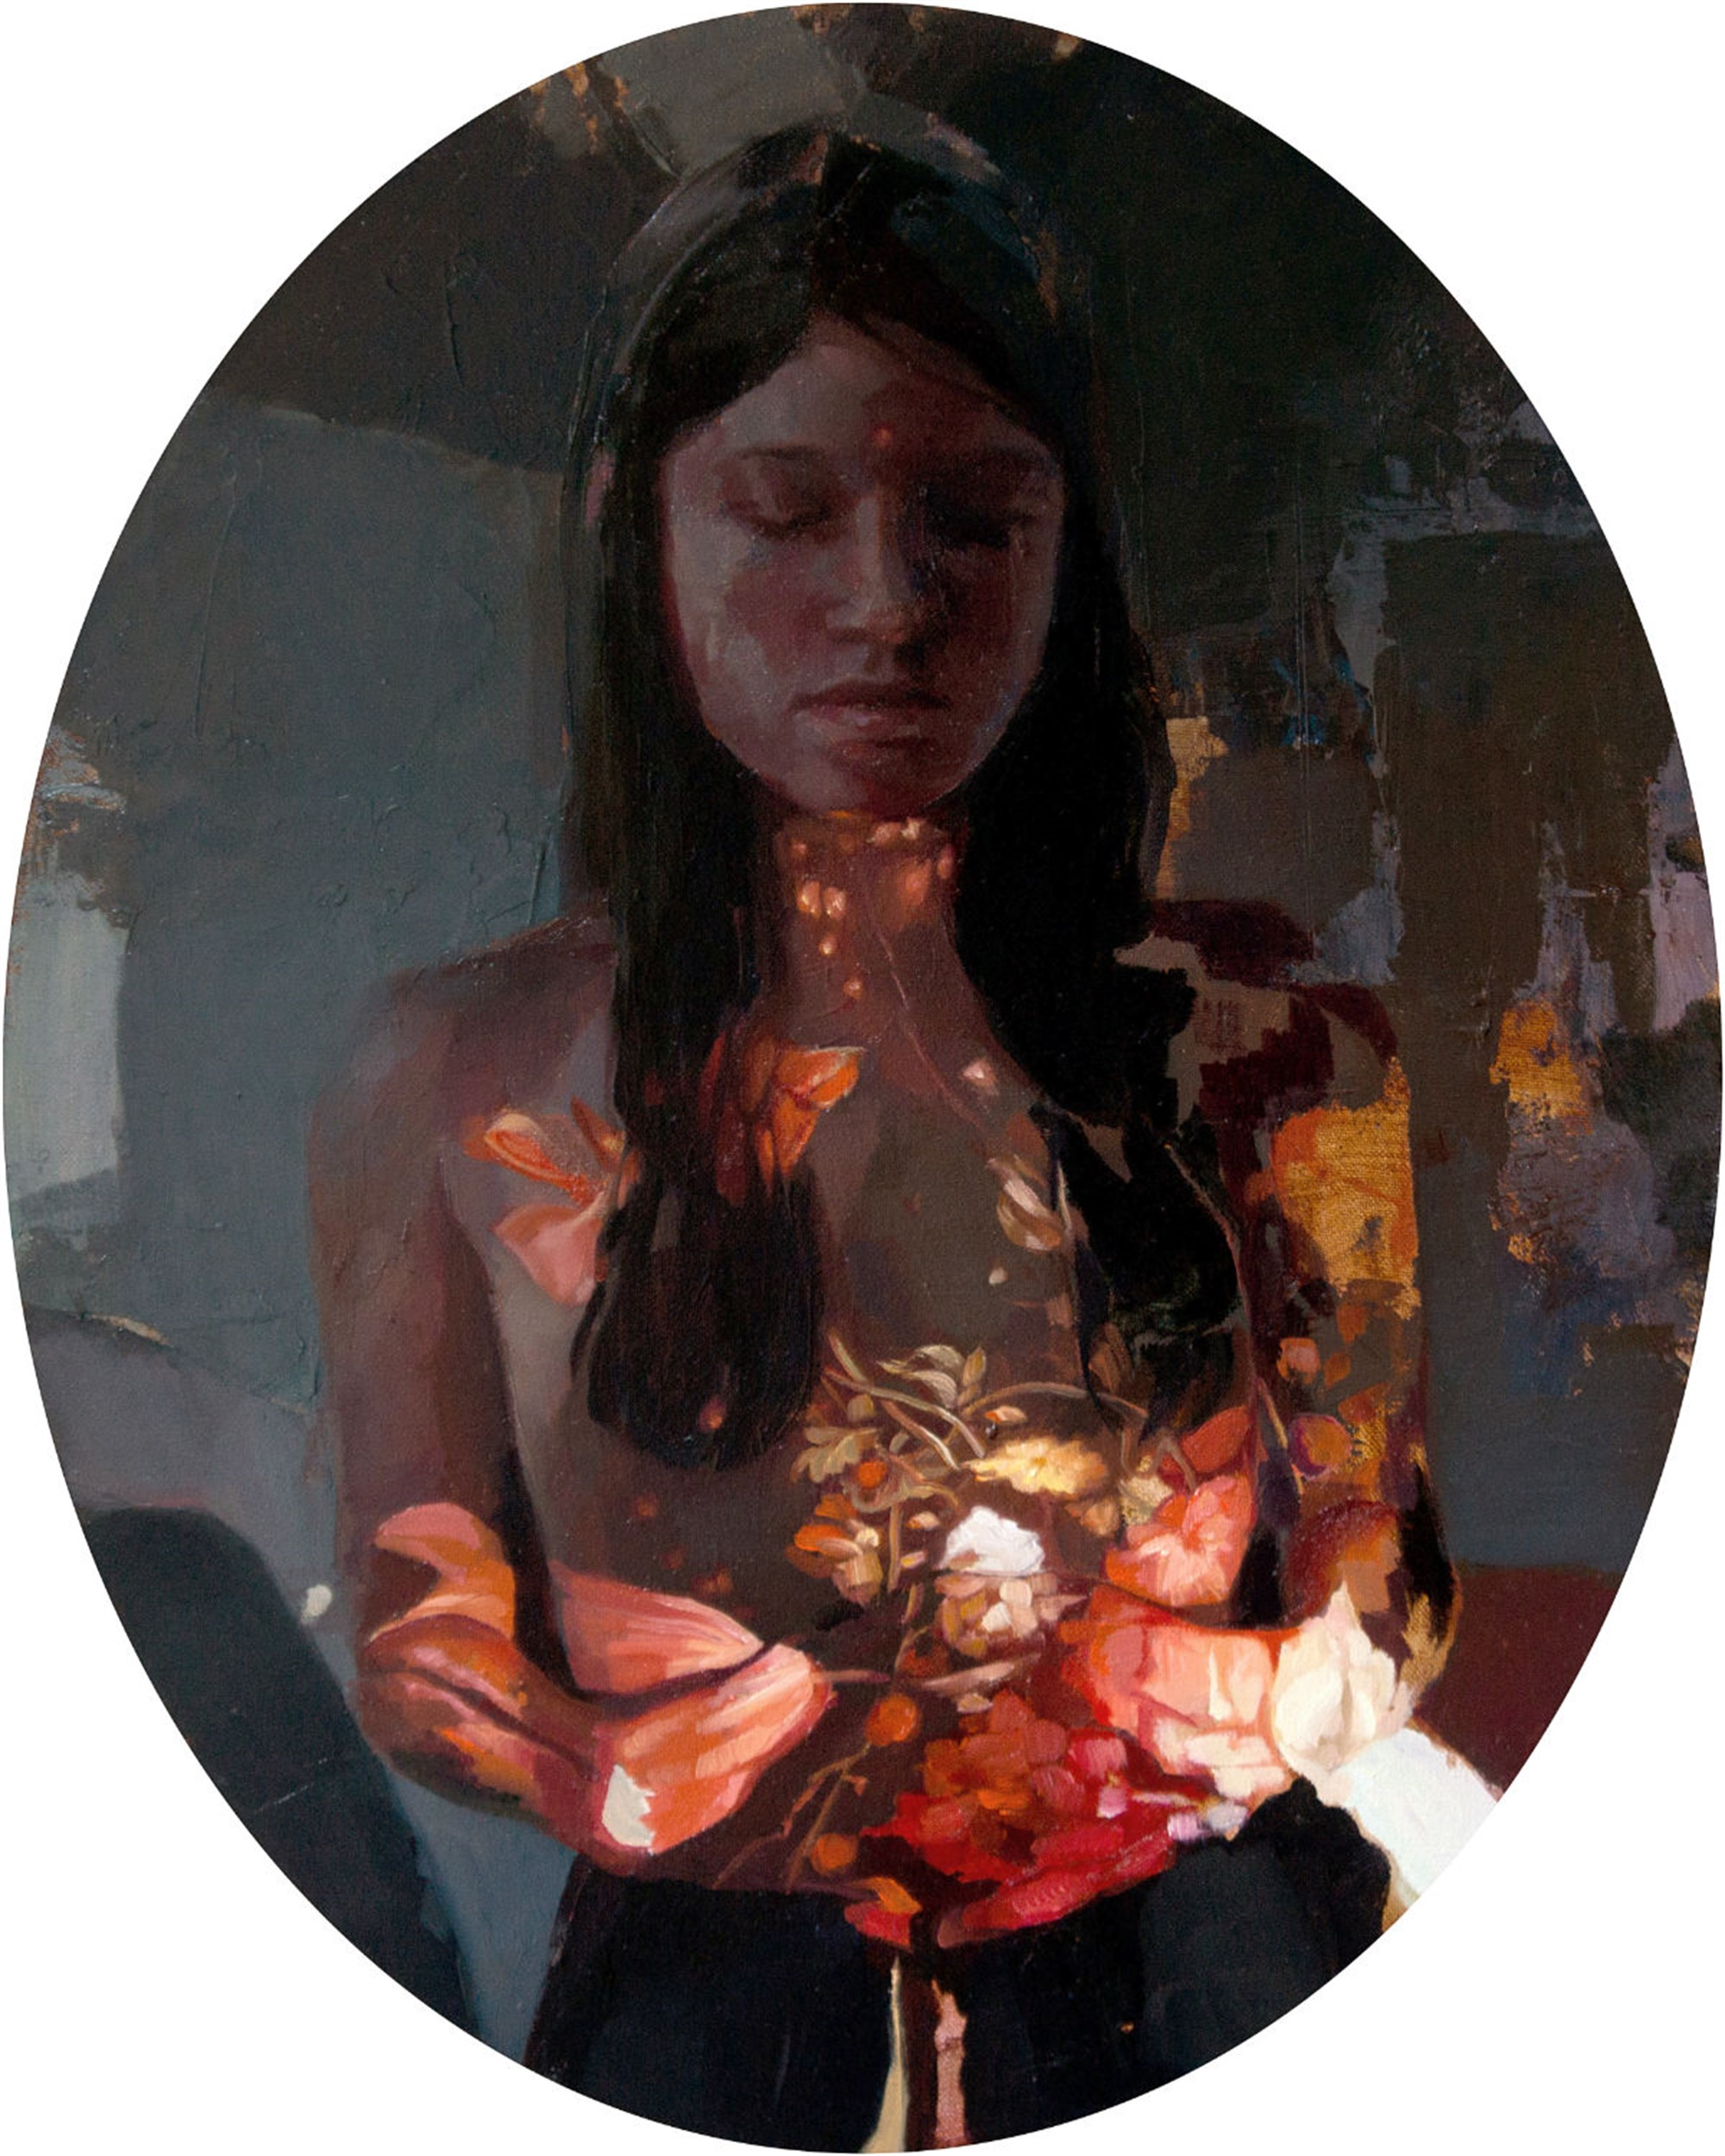 The Glow II by Meghan Howland